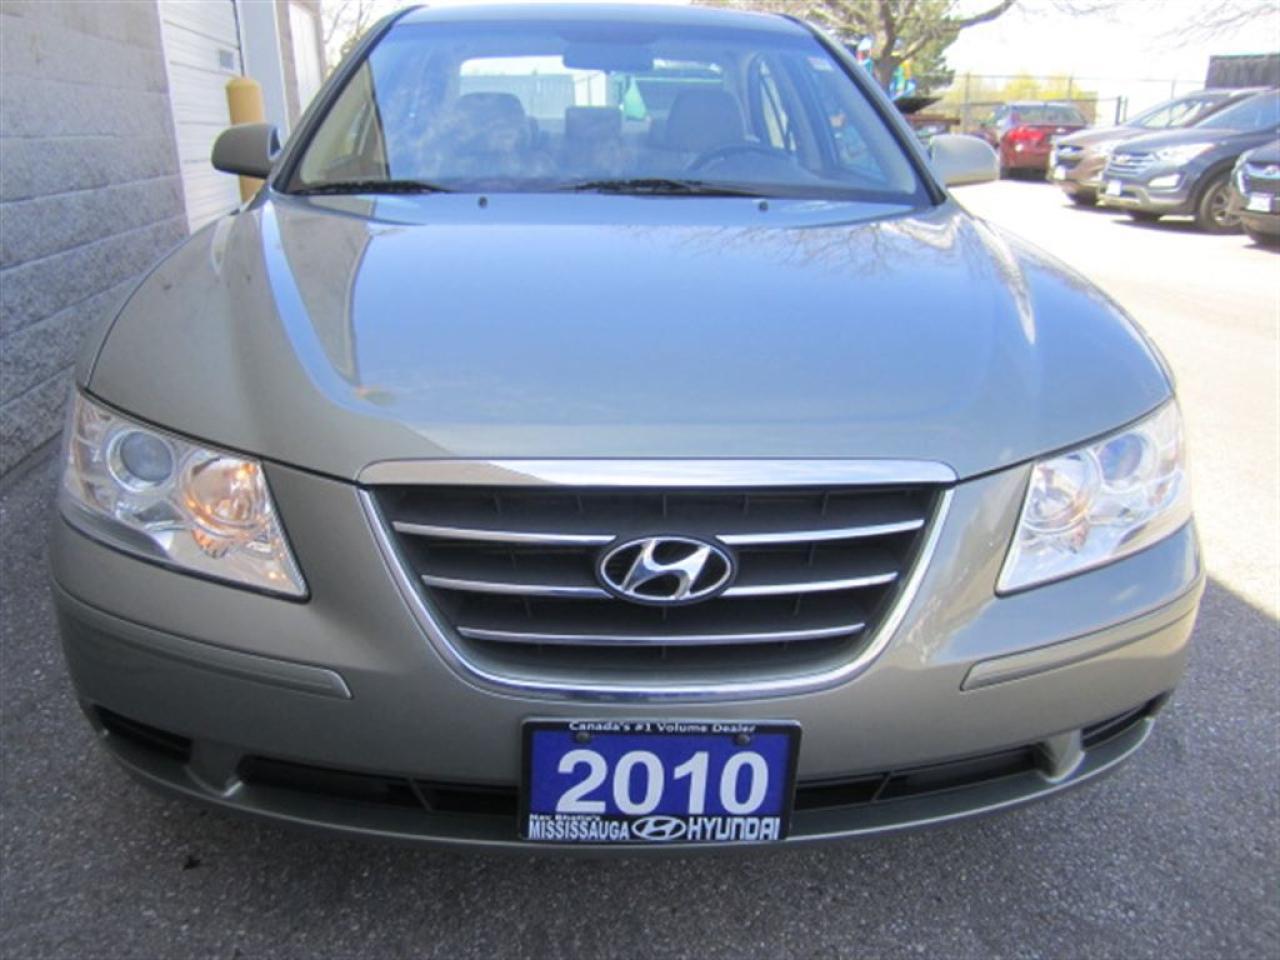 2010 Hyundai Sonata GL-excellent maintenance records!!!